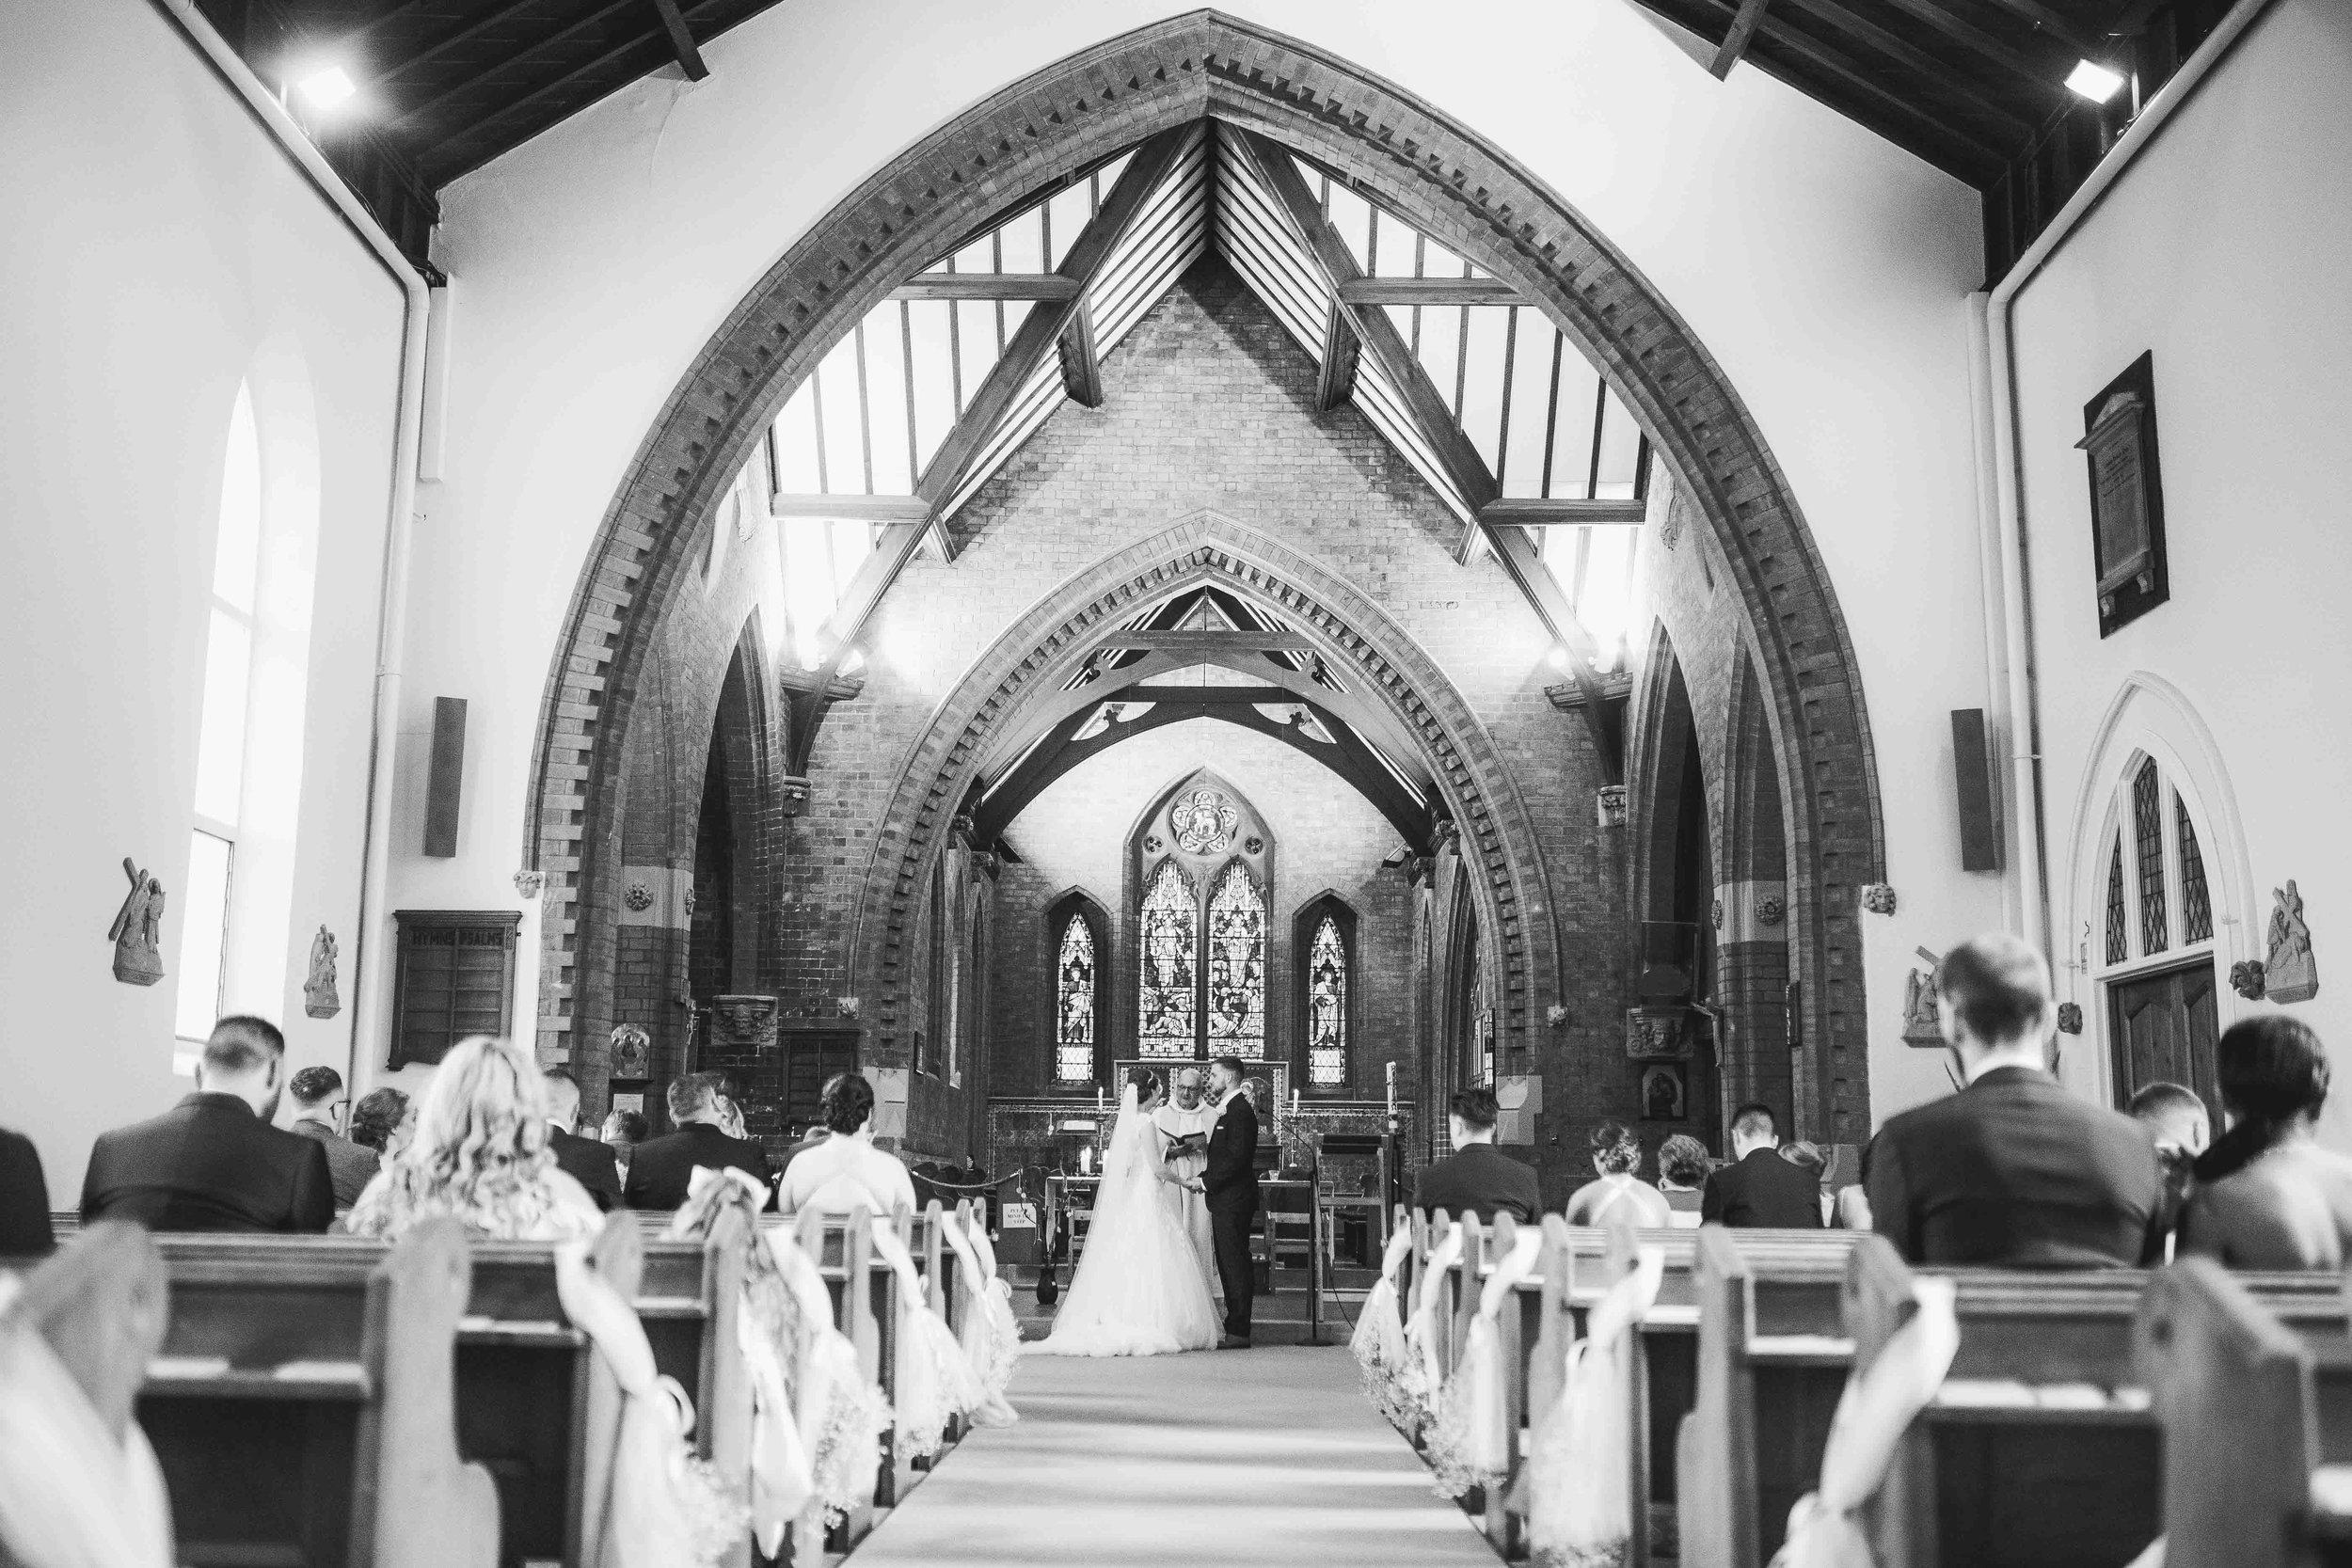 Lea-cooper-photography-willenhall-wolverhampton-wedding-photographer-birmingham-shirley-west-midlands-ceremony-church-11.JPG